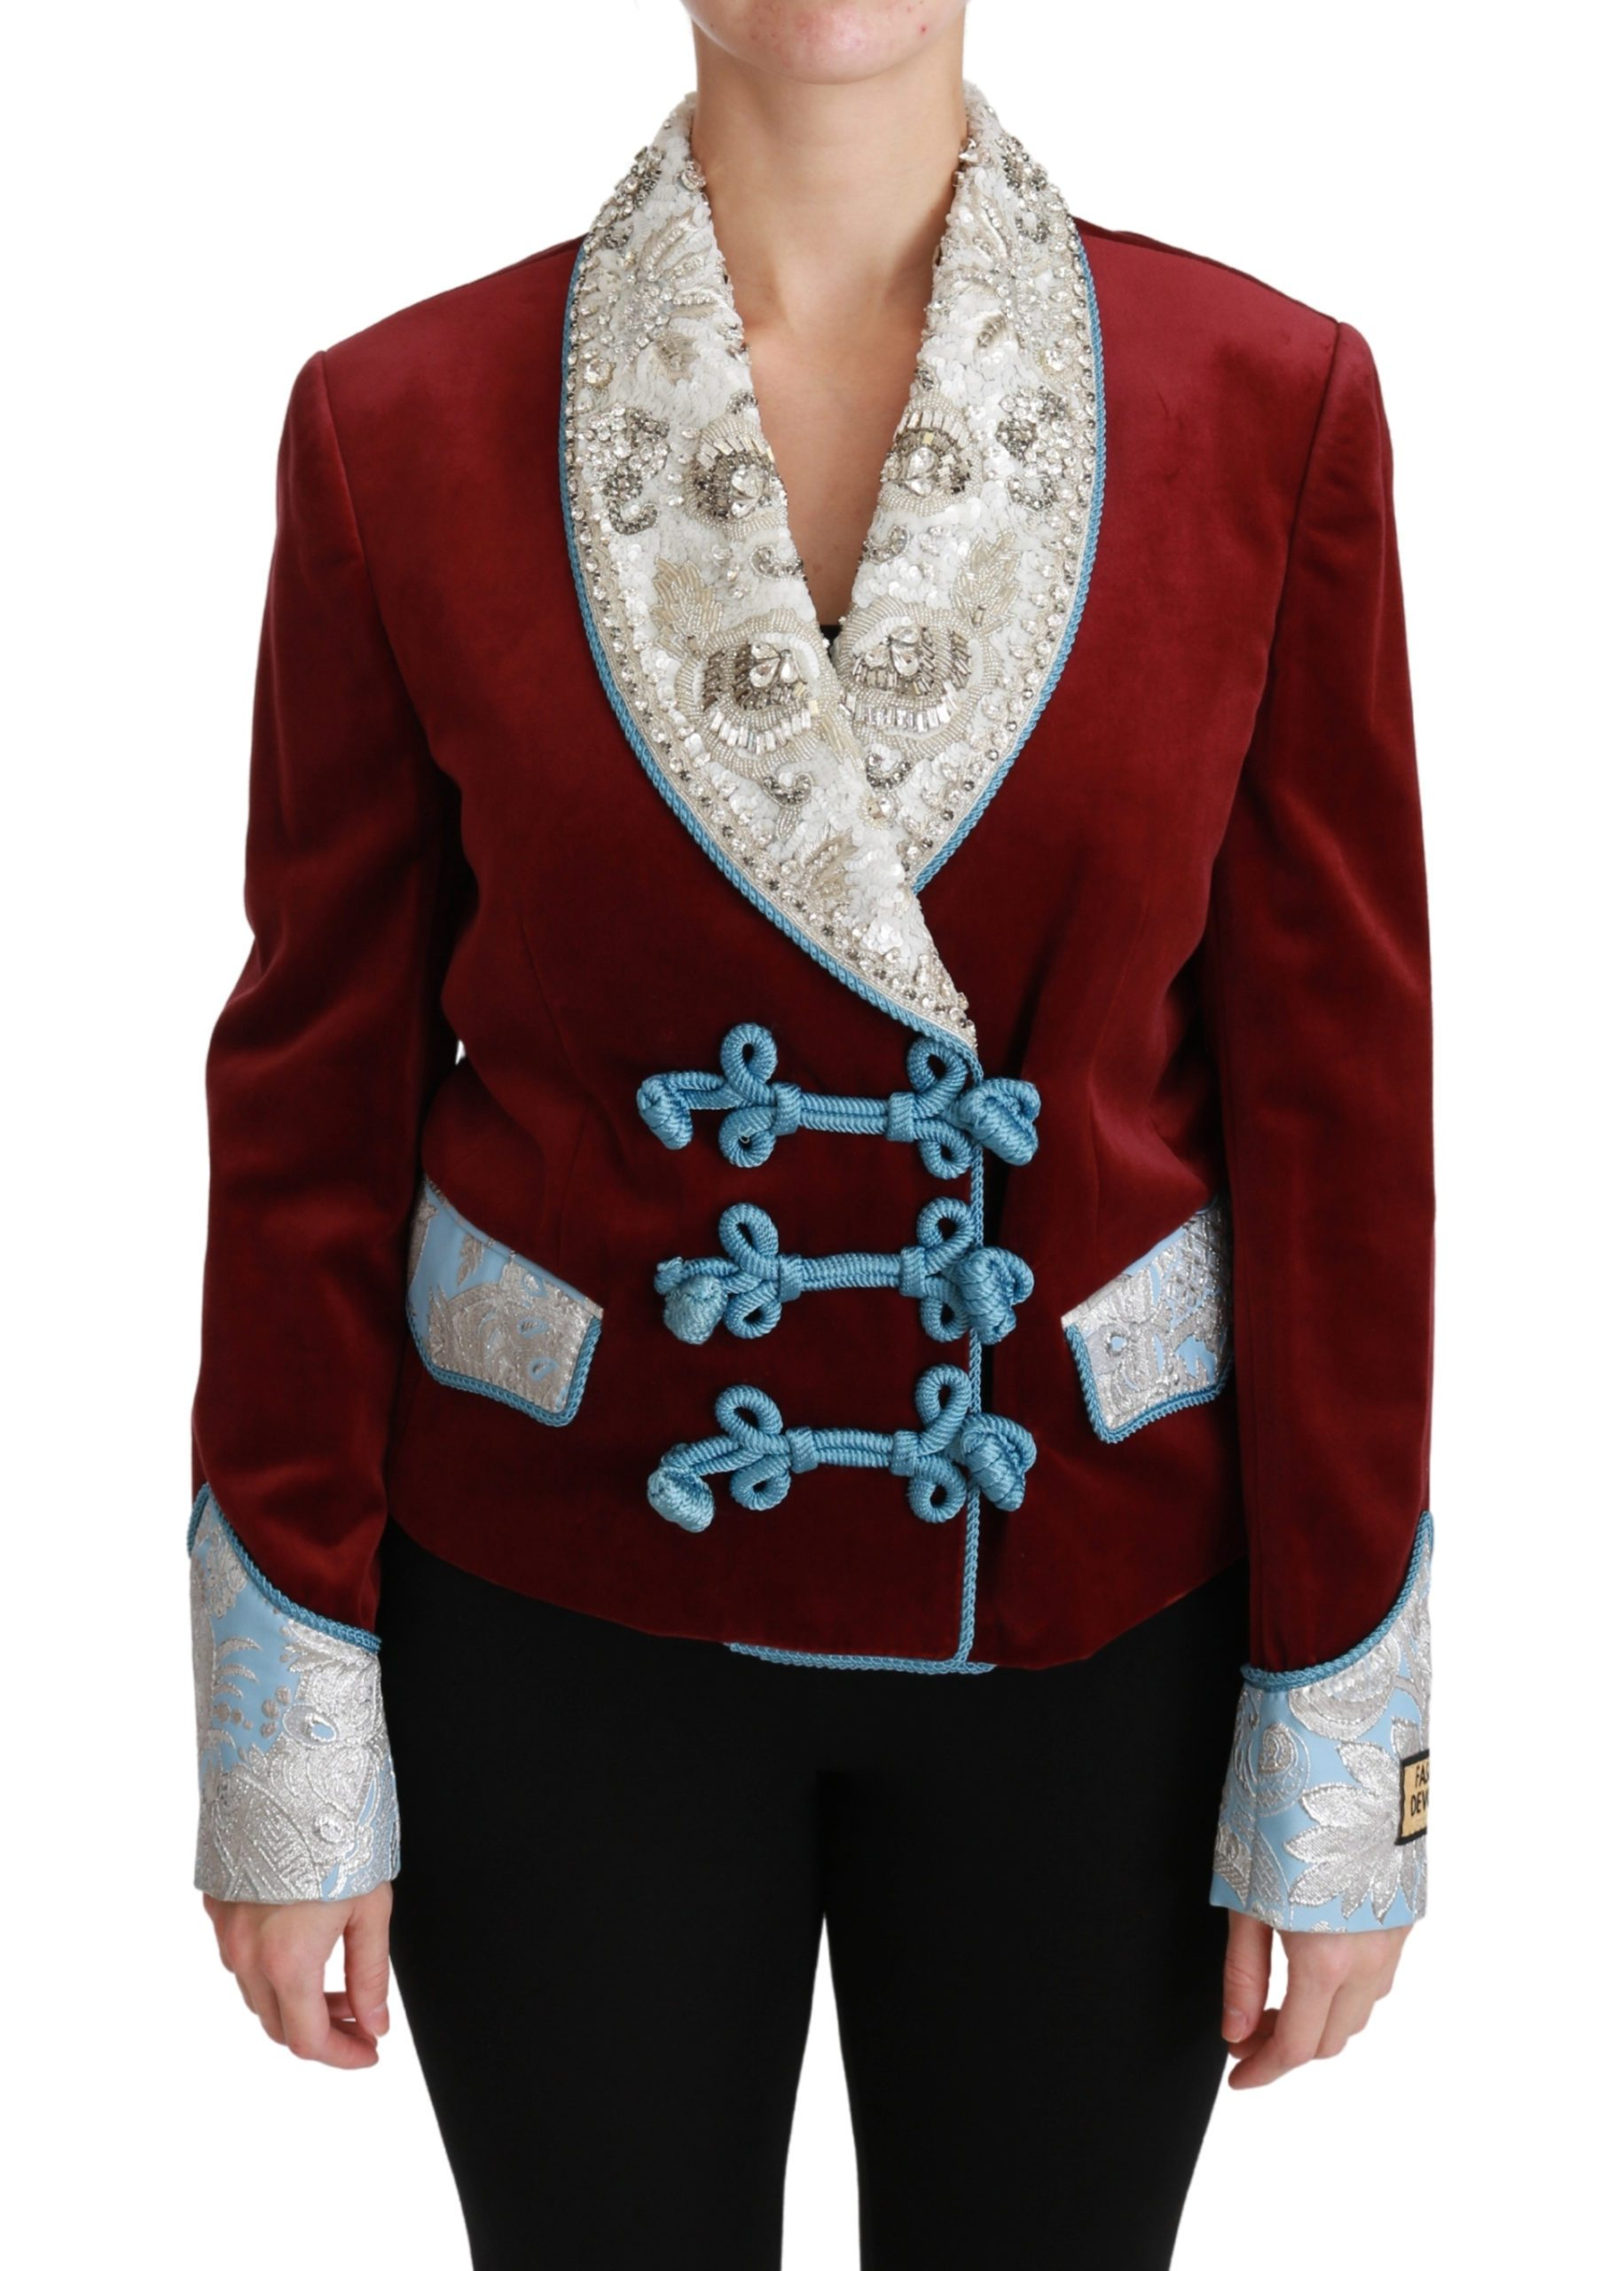 Dolce & Gabbana Women's Baroque Crystal Blazer Jacket Red JKT2558 - IT38 XS